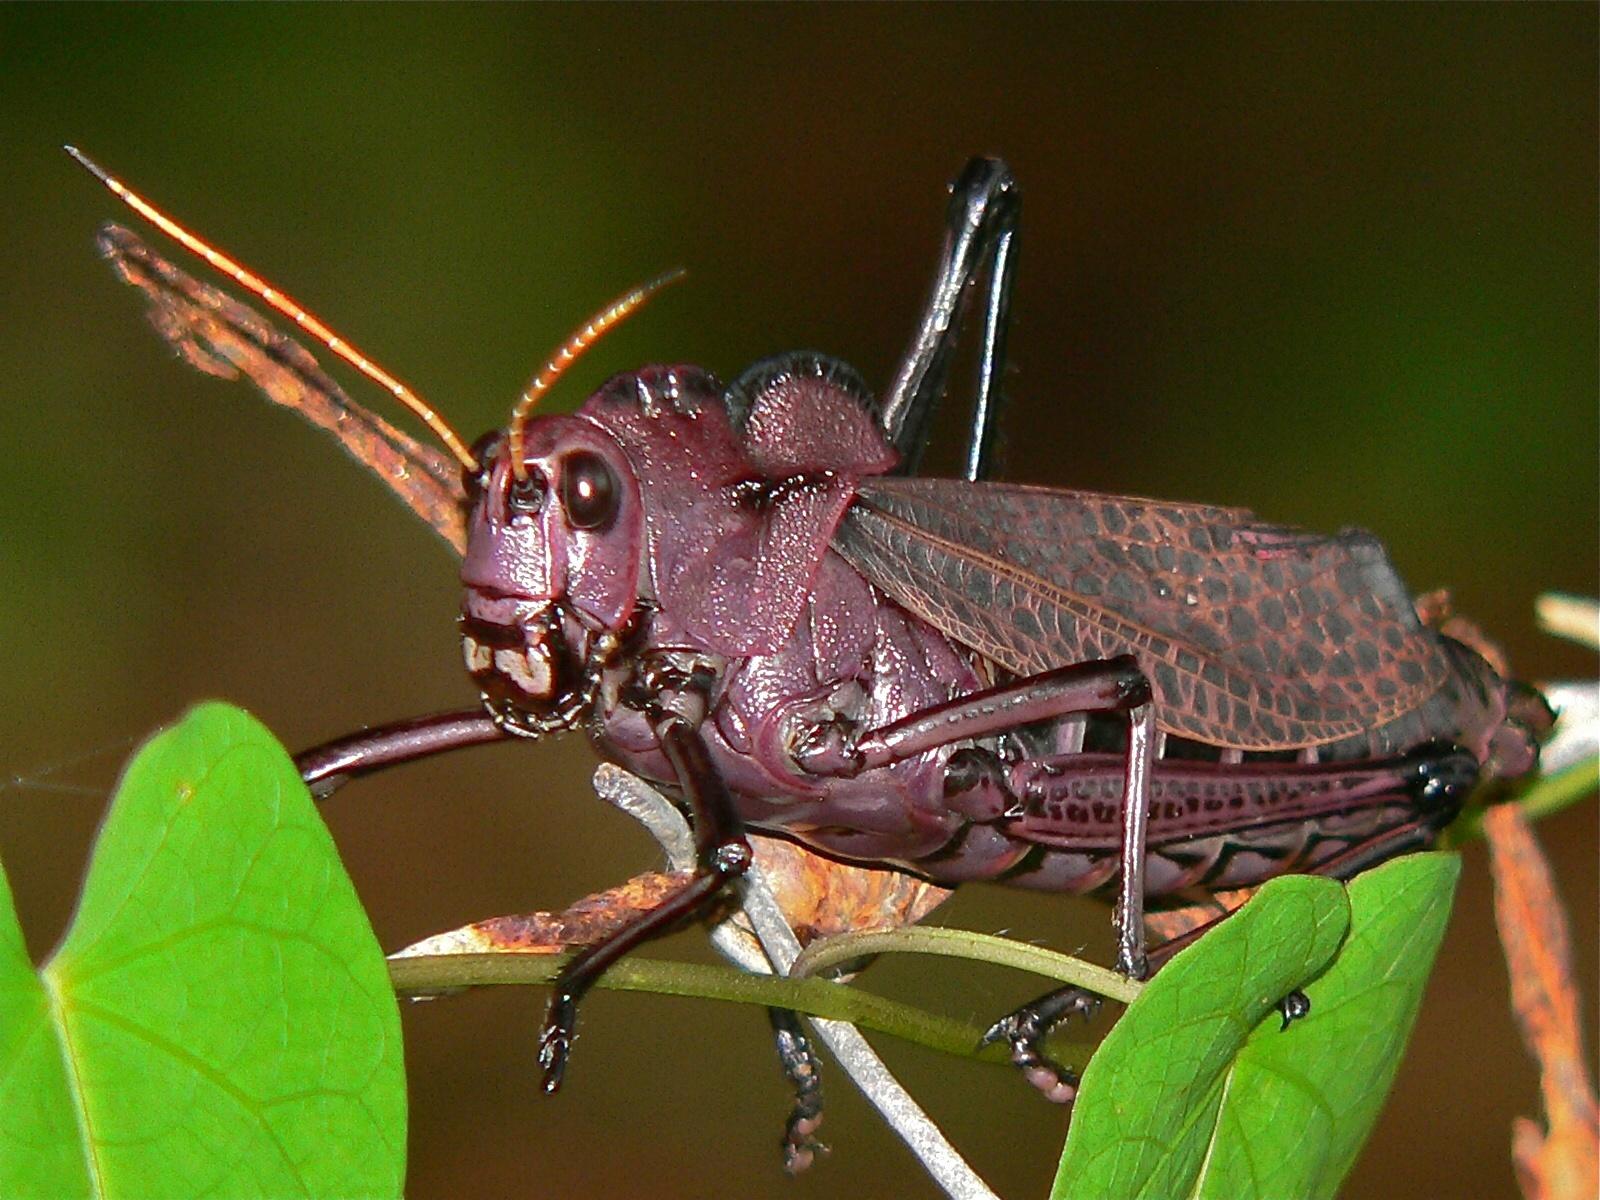 Image of lubber grasshopper